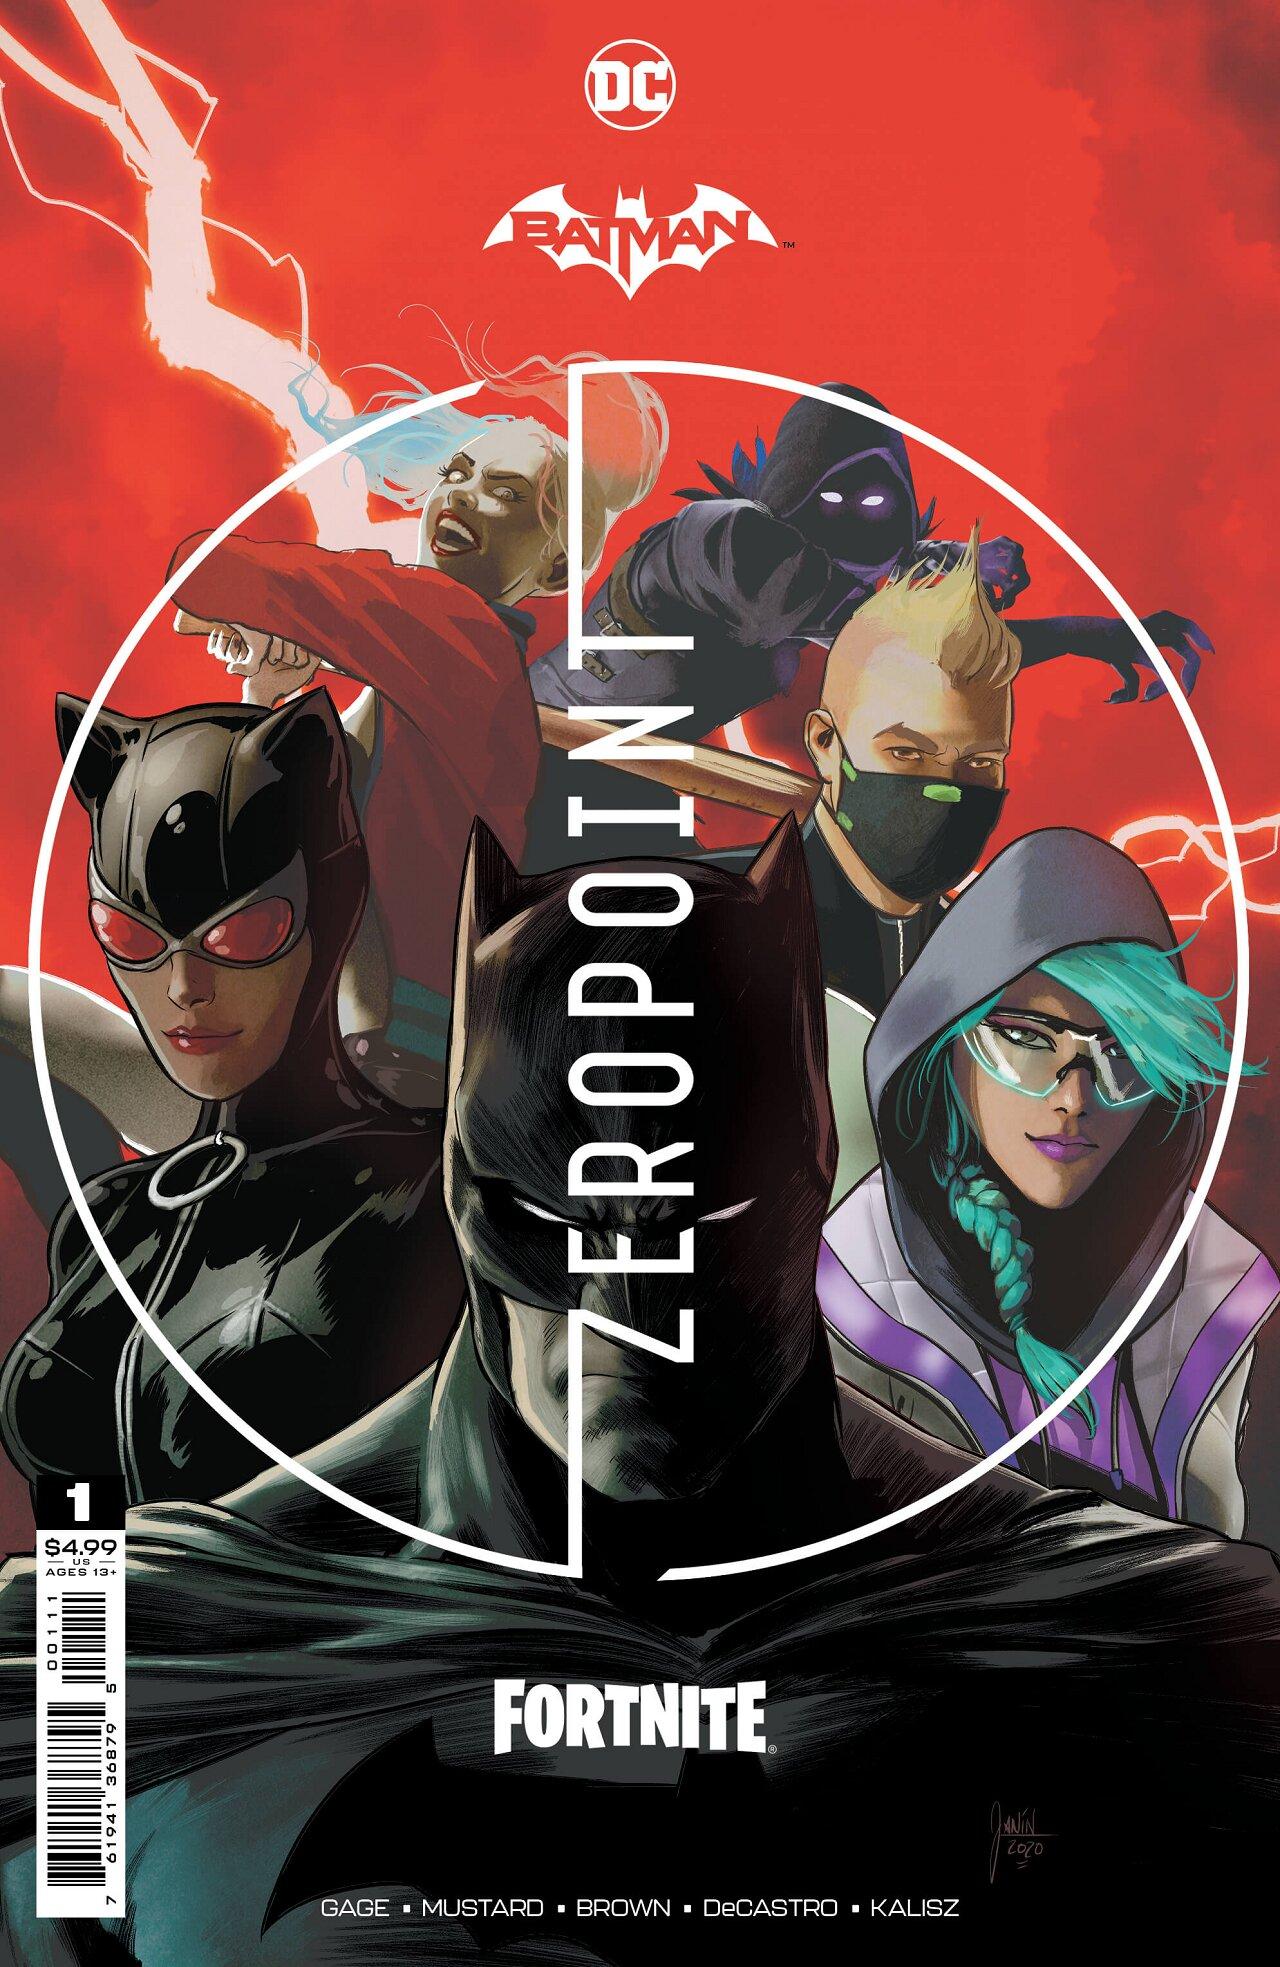 batman dc comics fortnite epic game